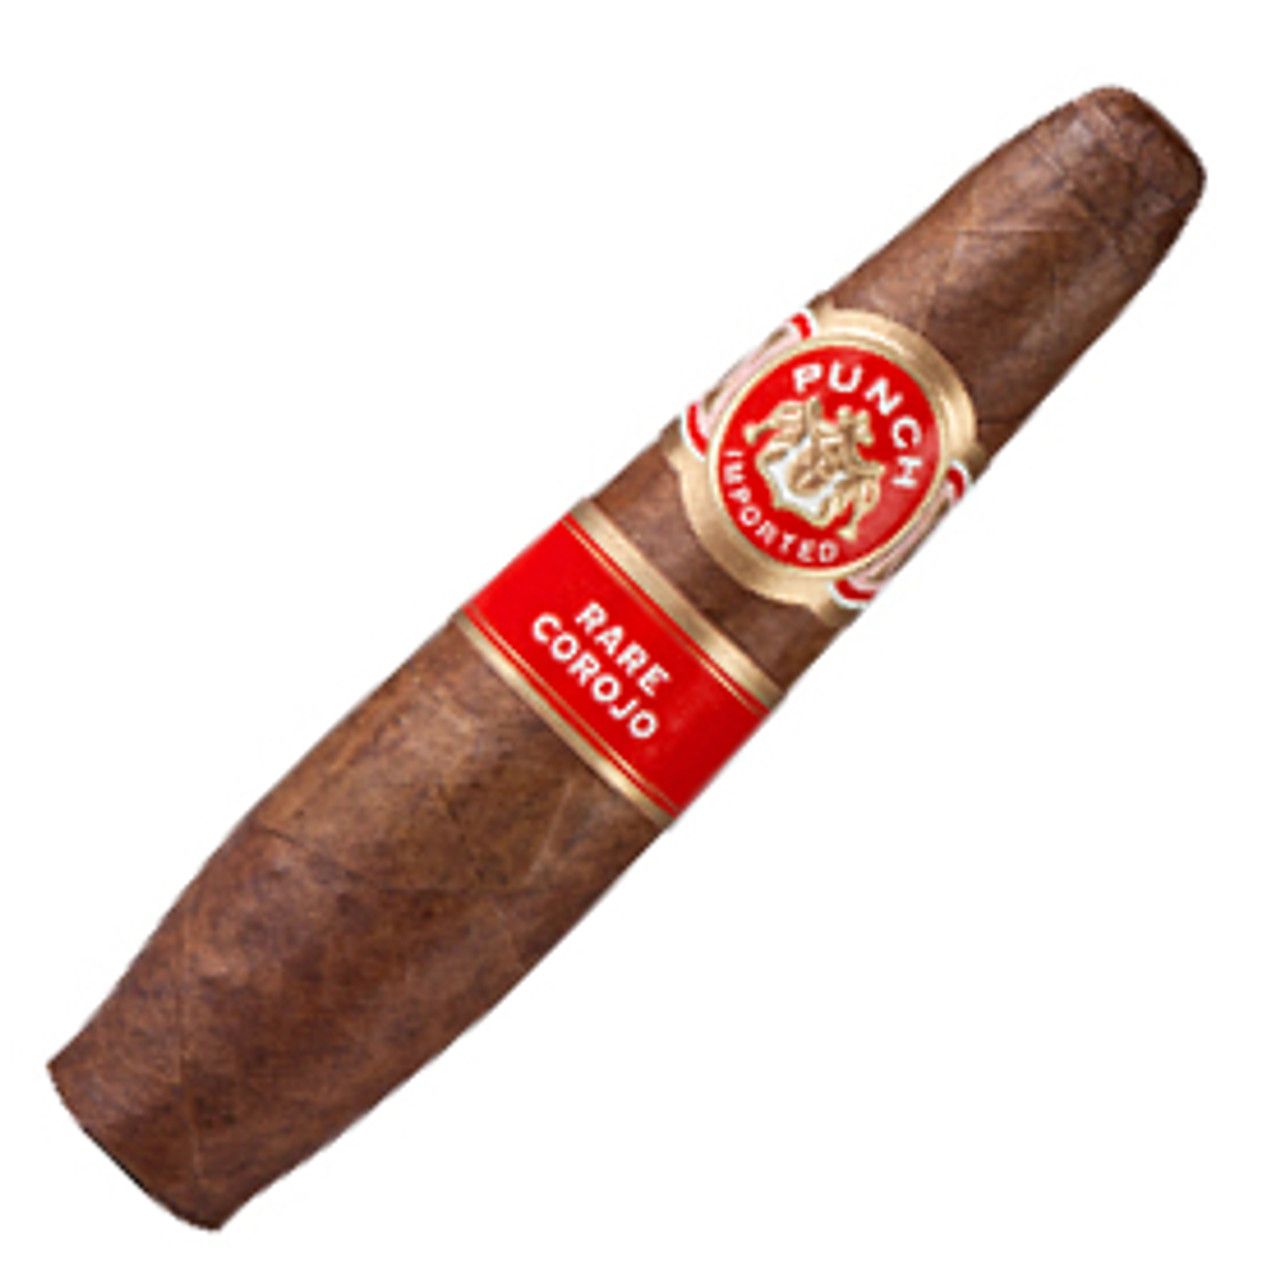 Punch Rare Corojo Champion Figurado Cigars - 4.5 x 60 (Box of 25)